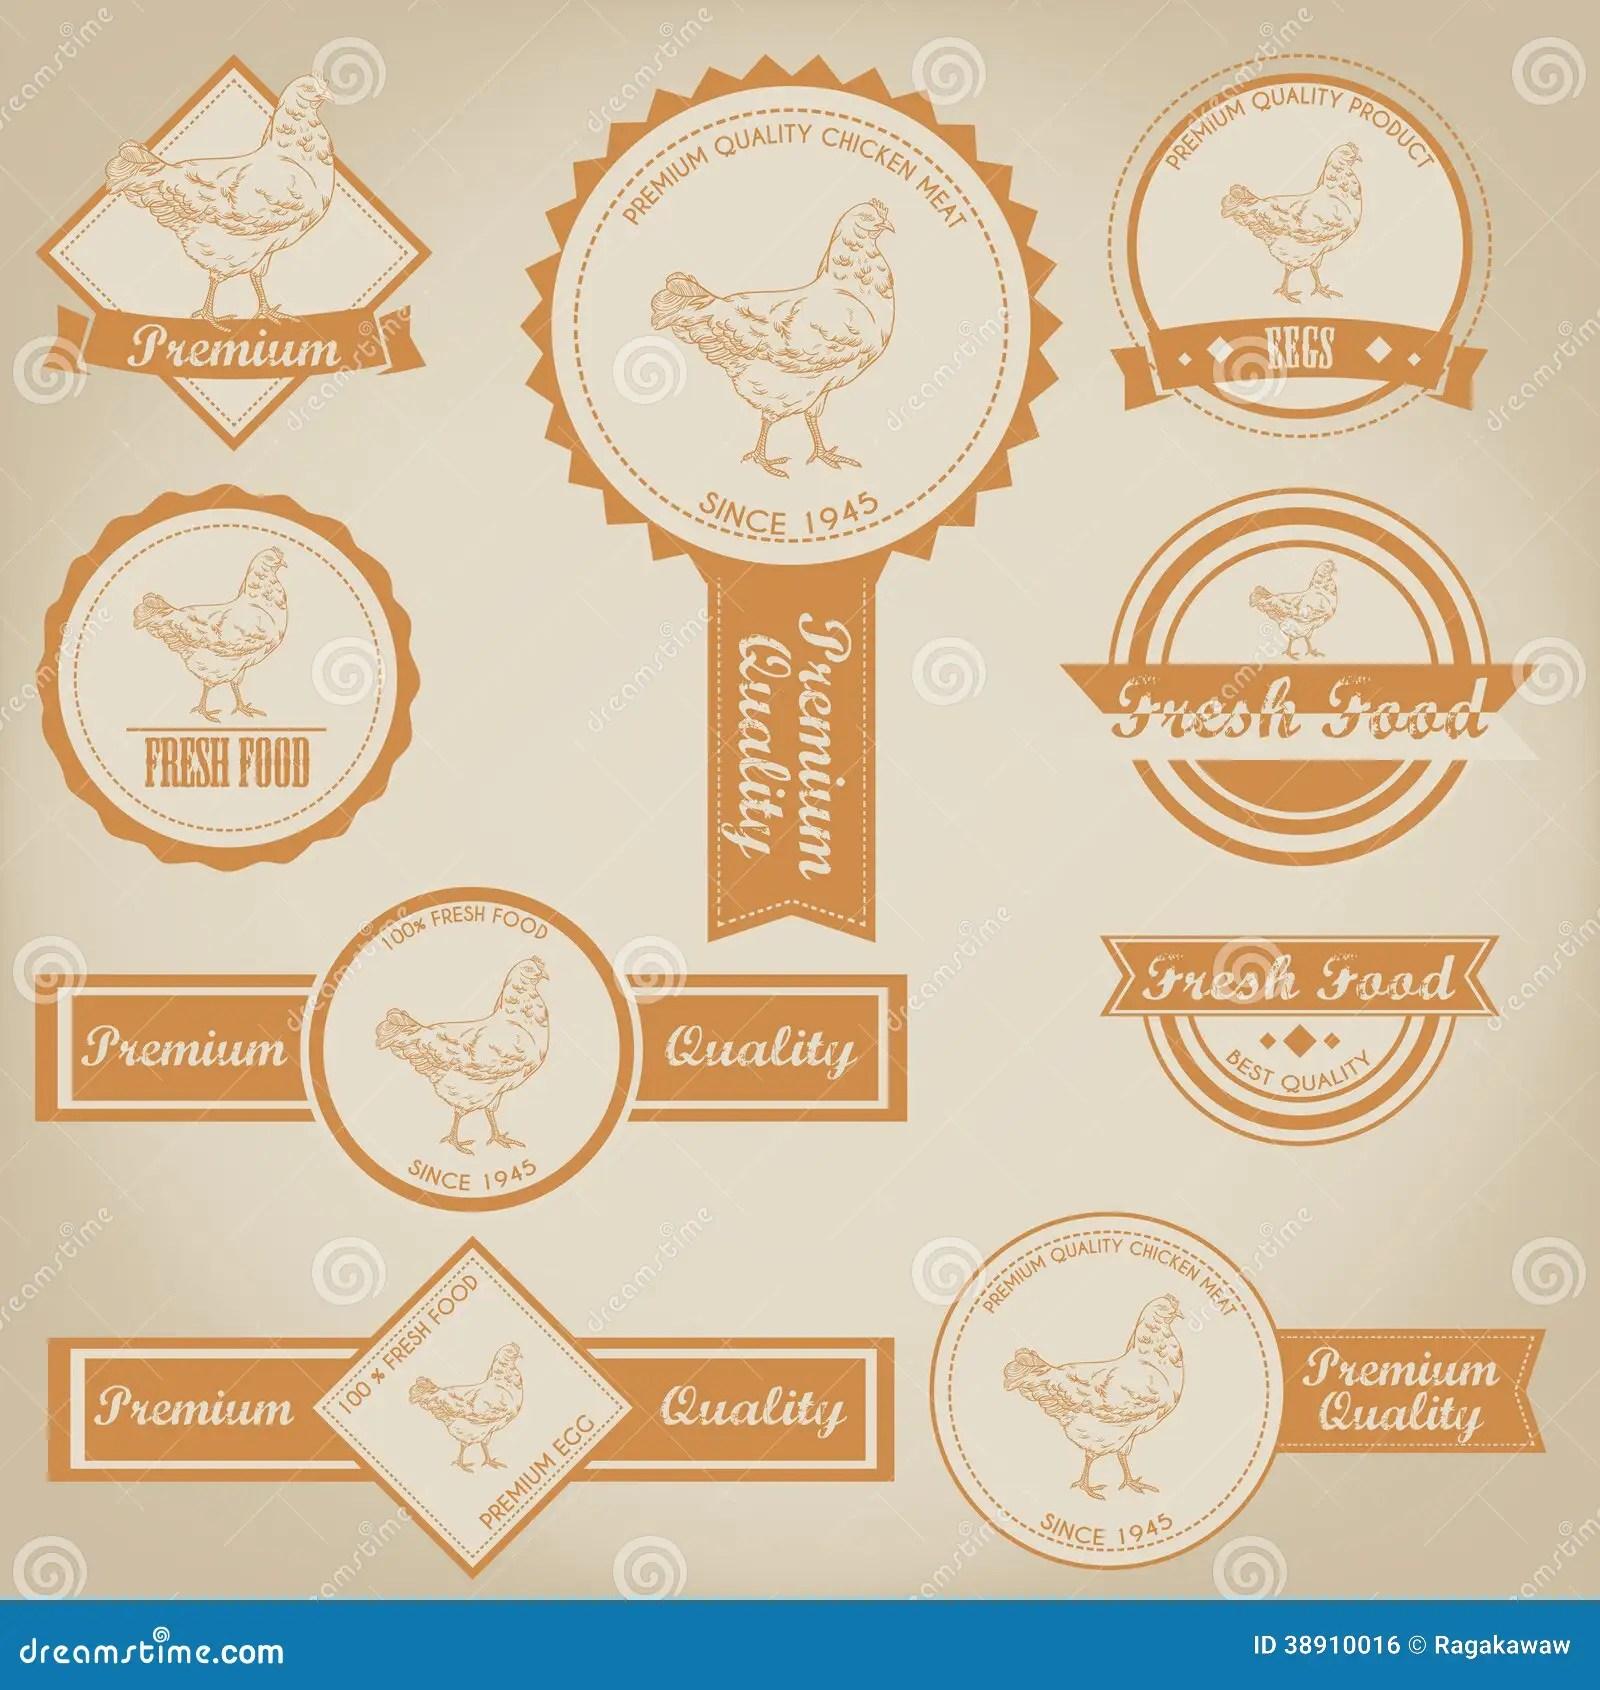 Chicken Meat Label Design Stock Vector Illustration Of